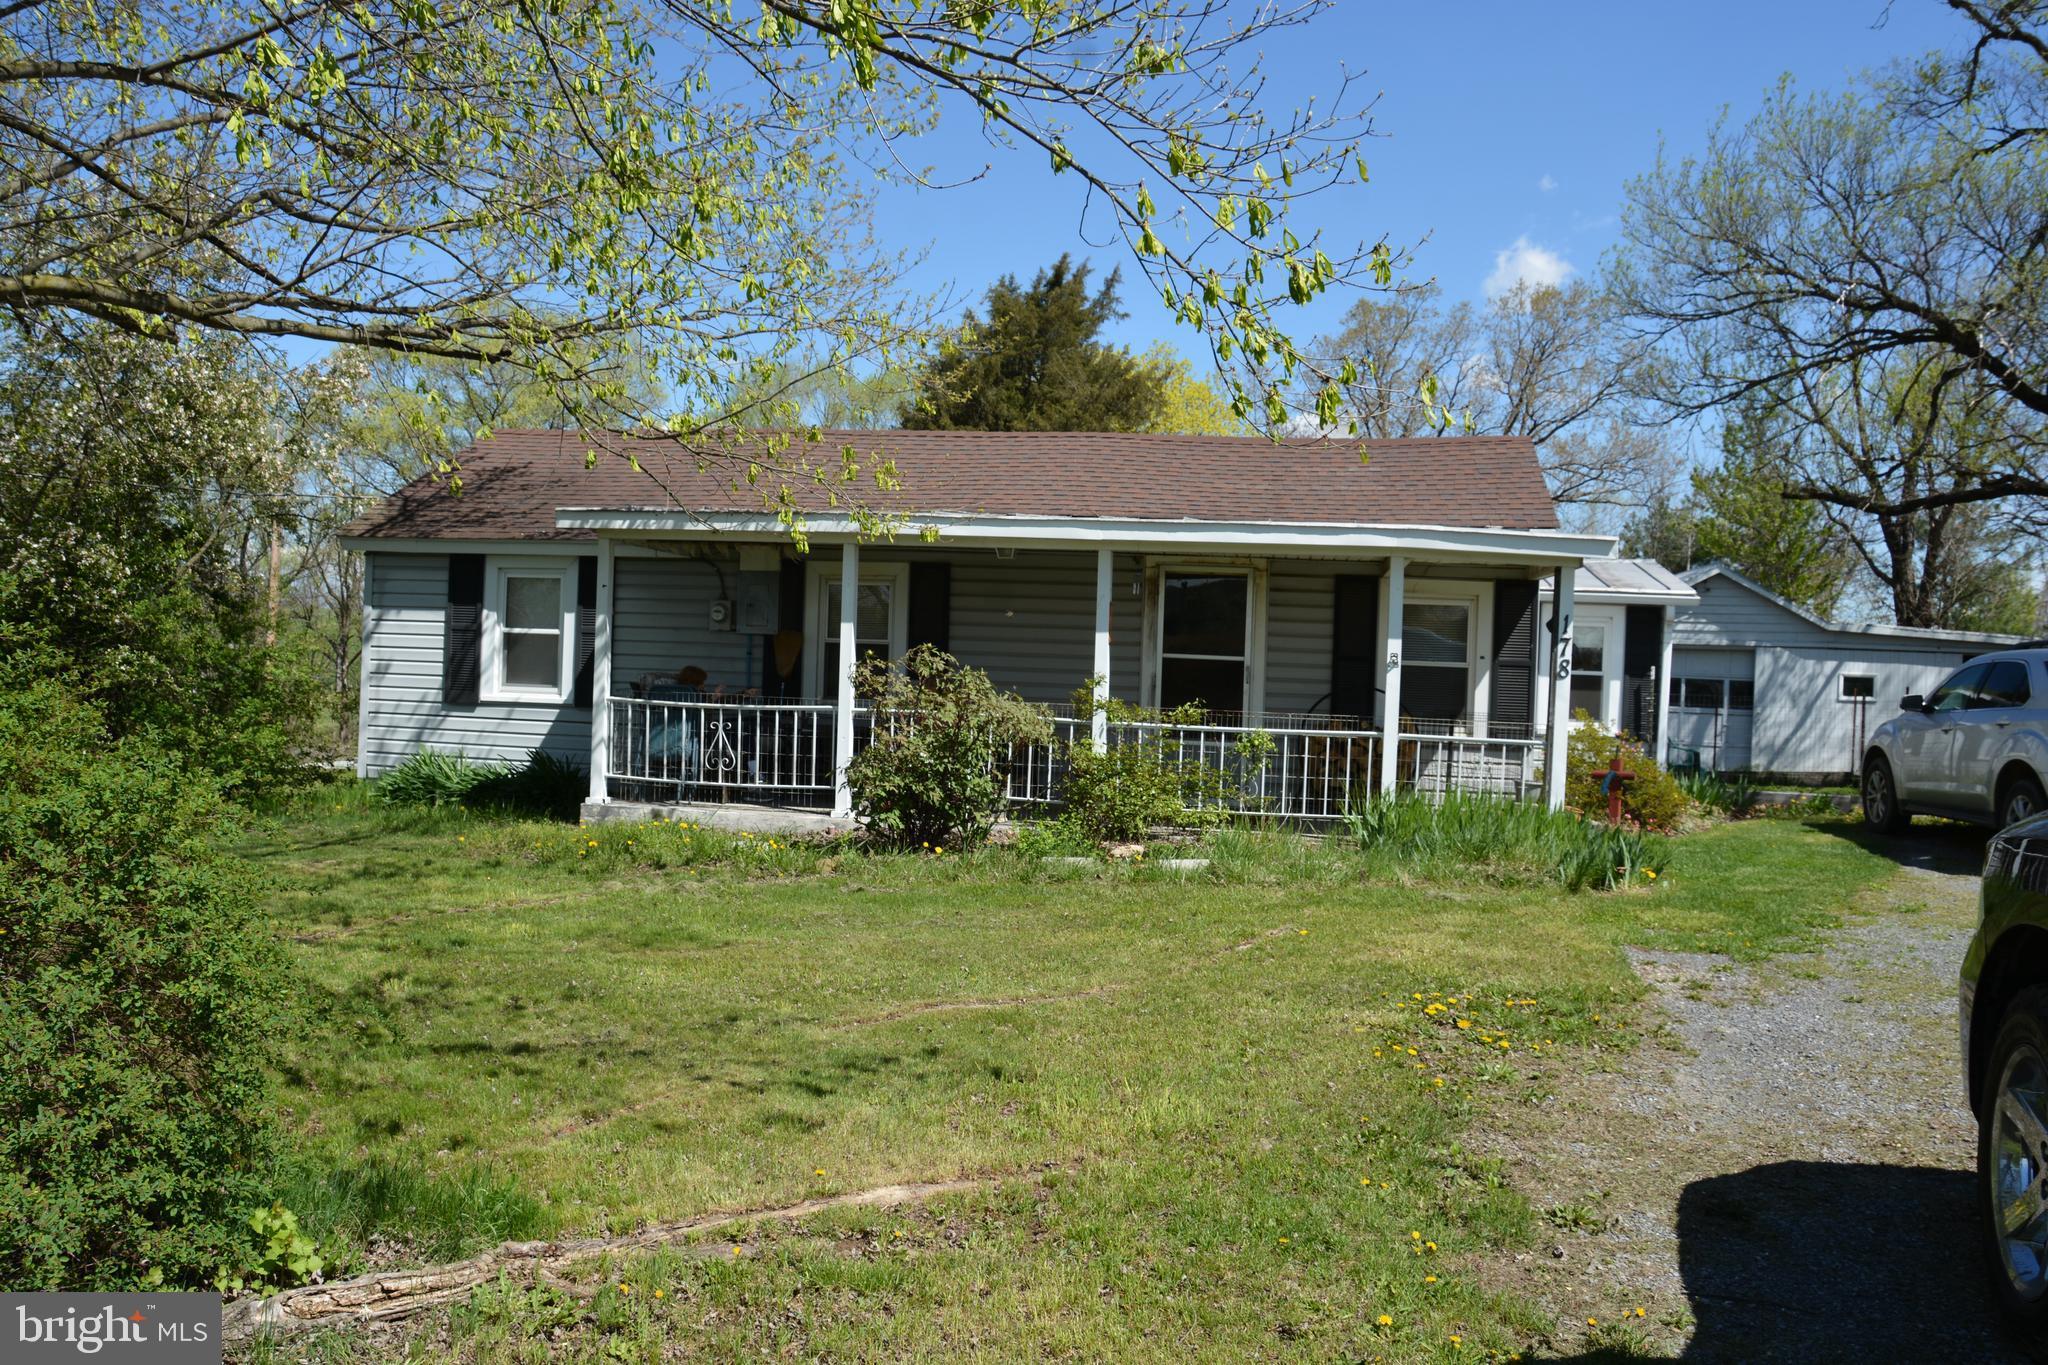 Comfortable bungalow, 3 bedrooms, bath, livingroom w/fireplace, detached garage for possible worksho